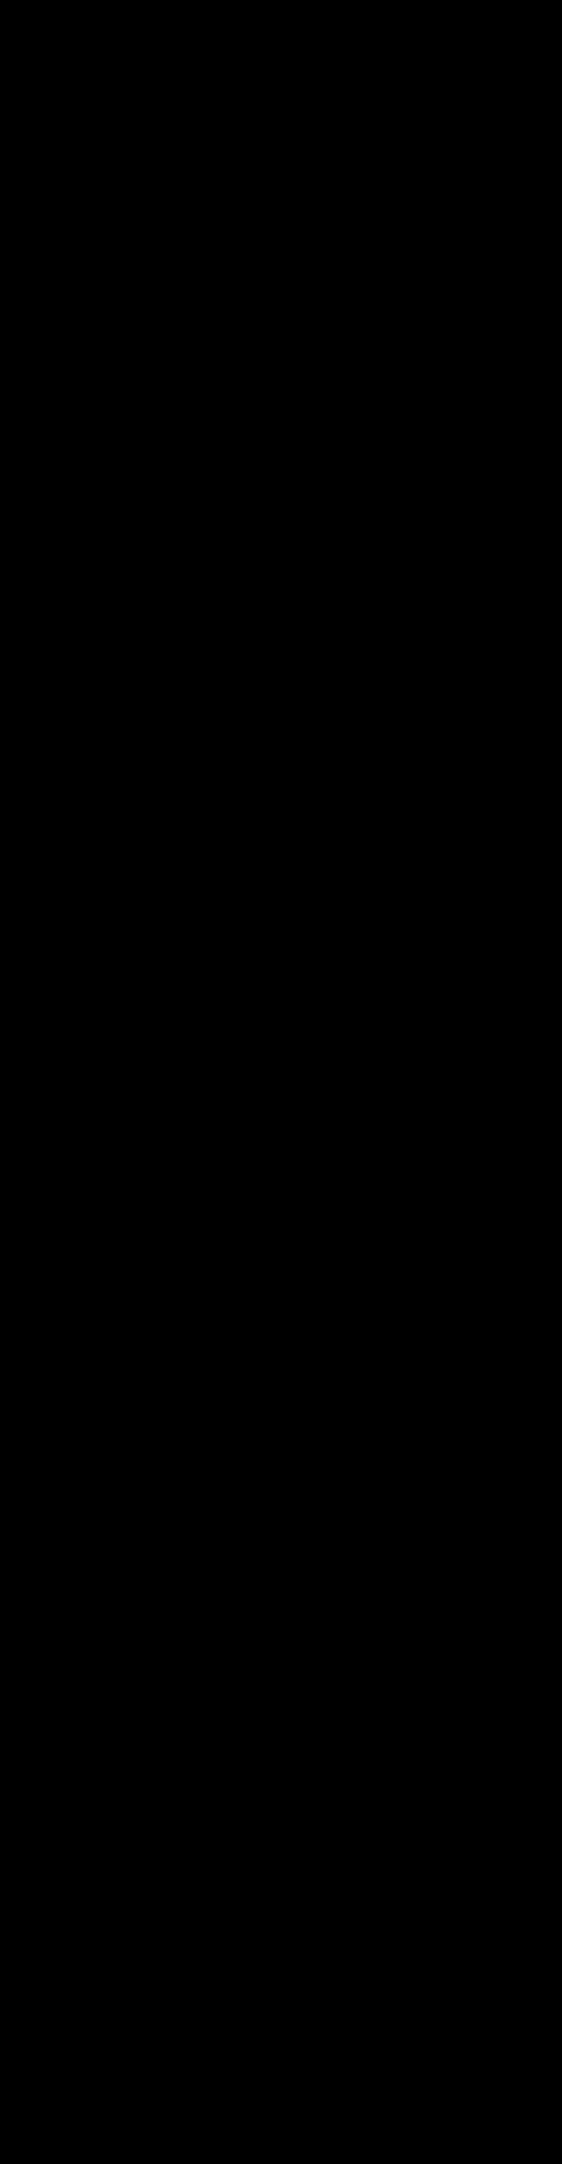 562x2164 Clipart